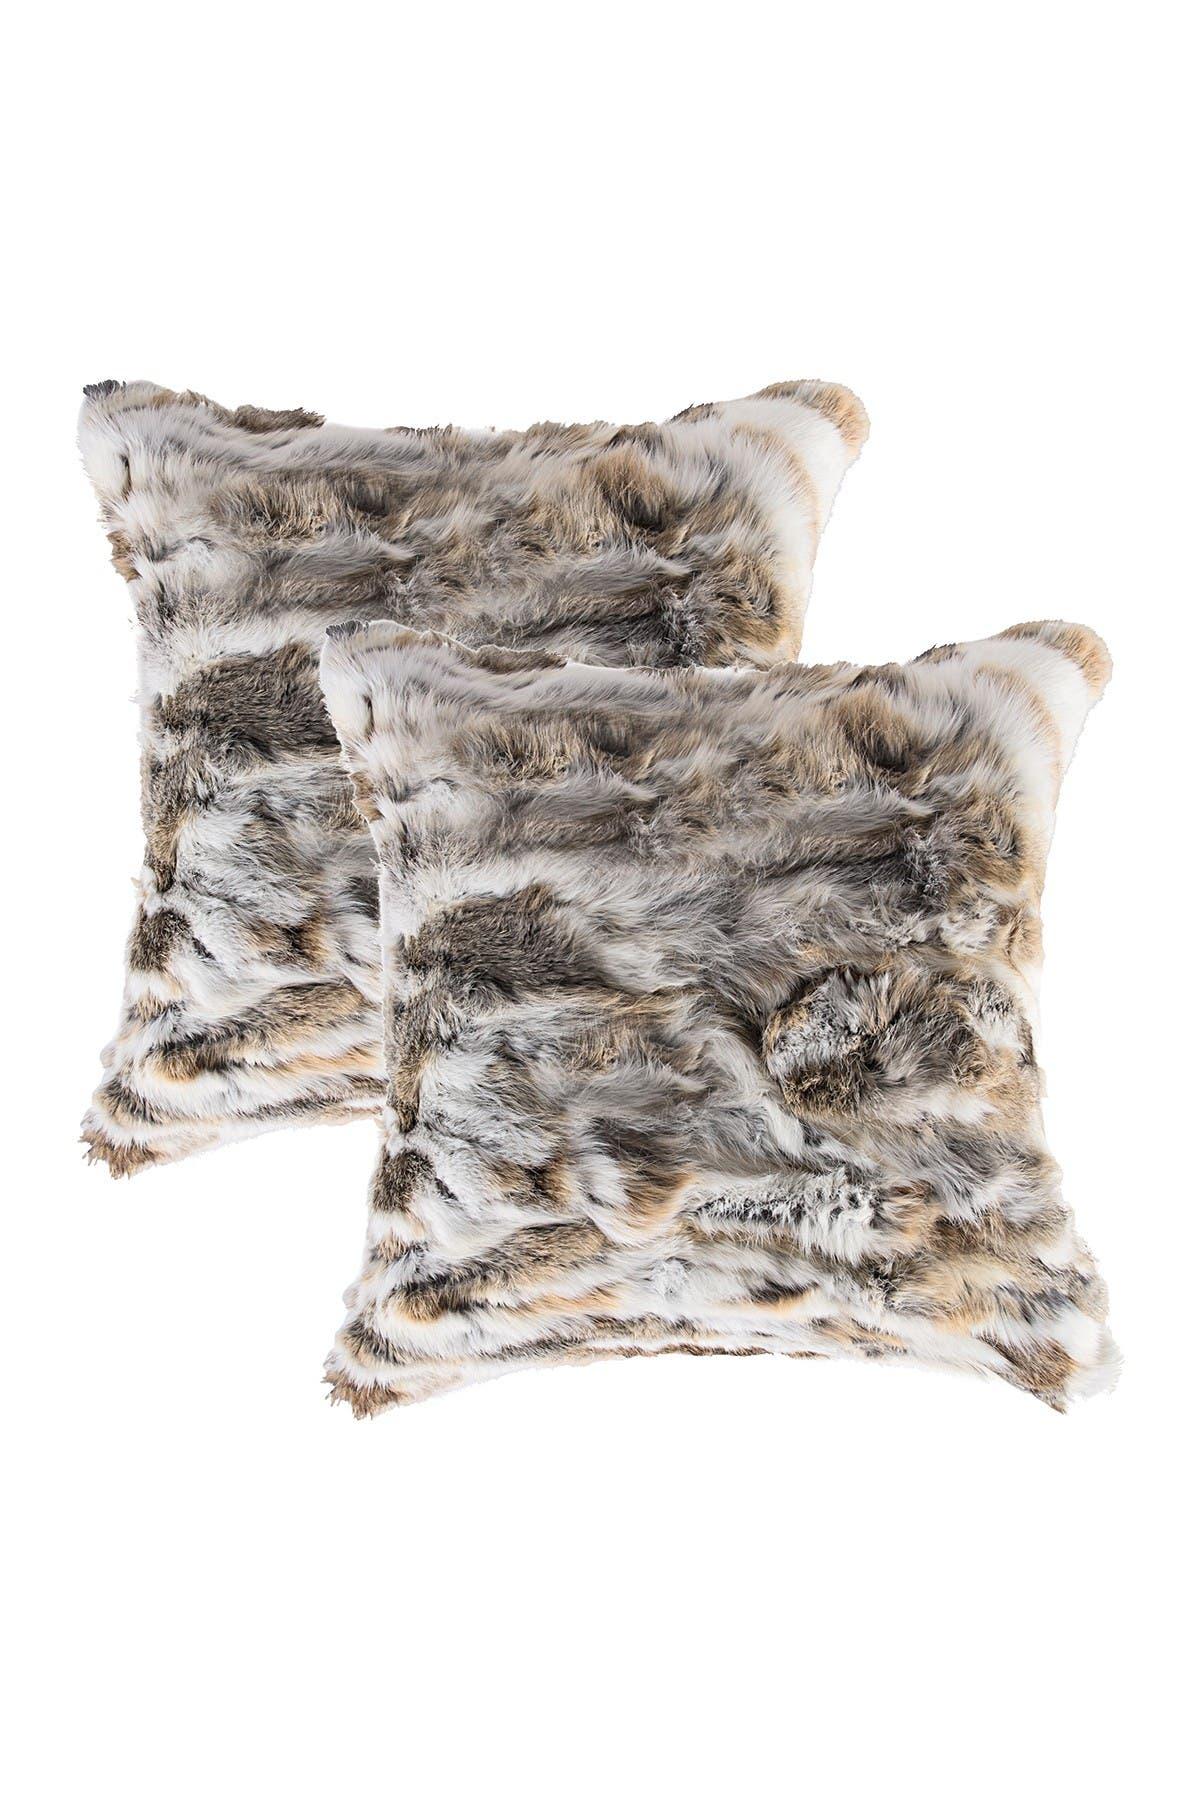 "Image of Natural Genuine Rabbit Fur Pillow - Set of 2 - 18"" x 18"" - Tan/White"